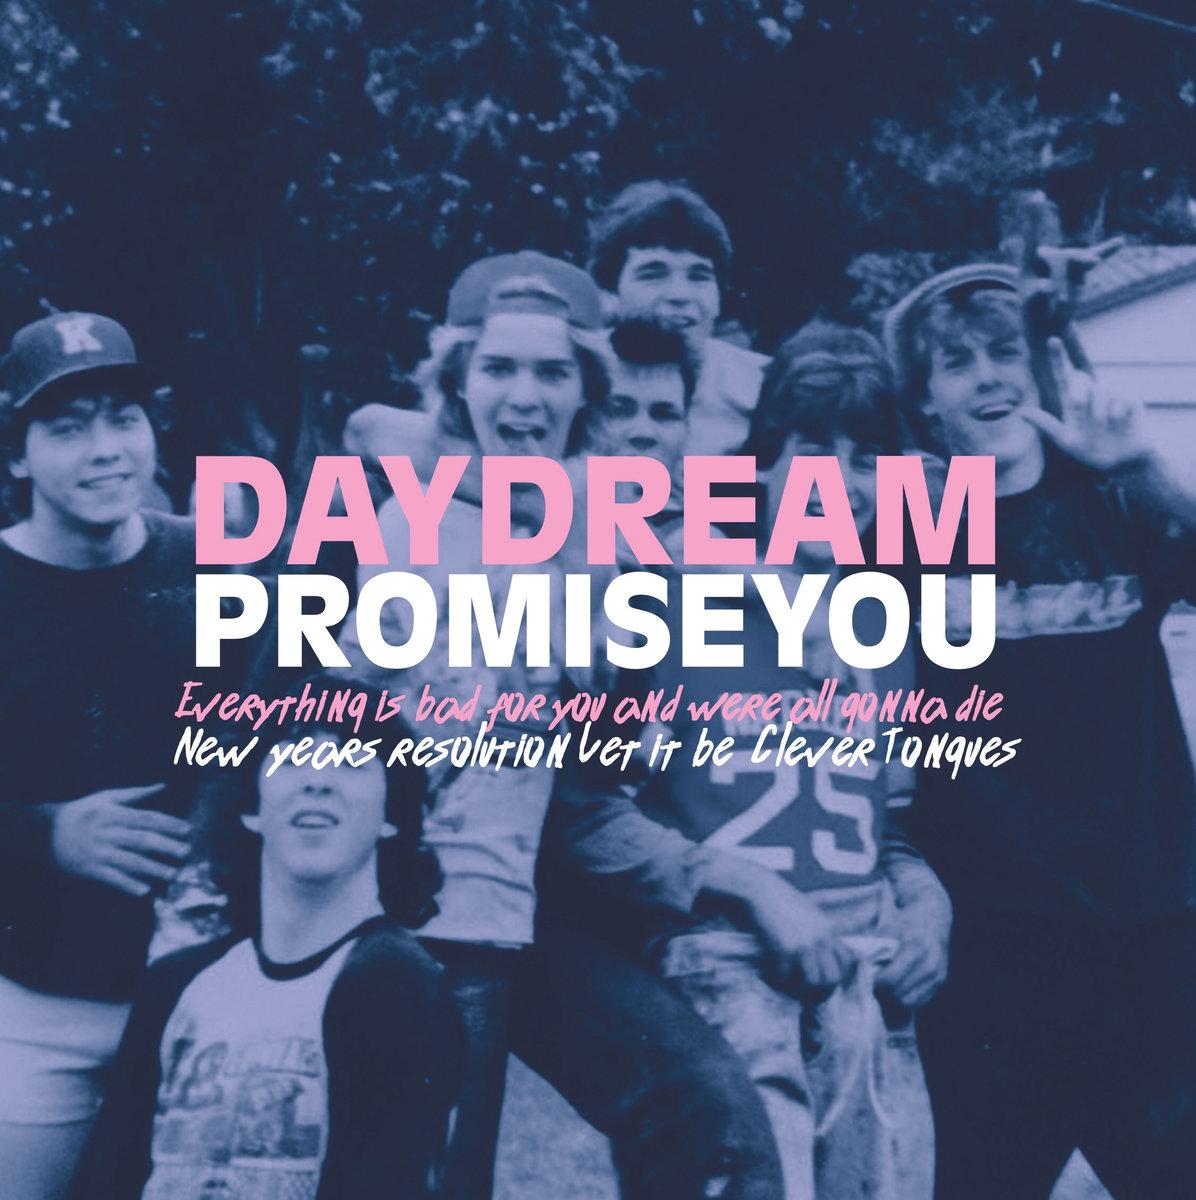 Daydream Promise You.jpg